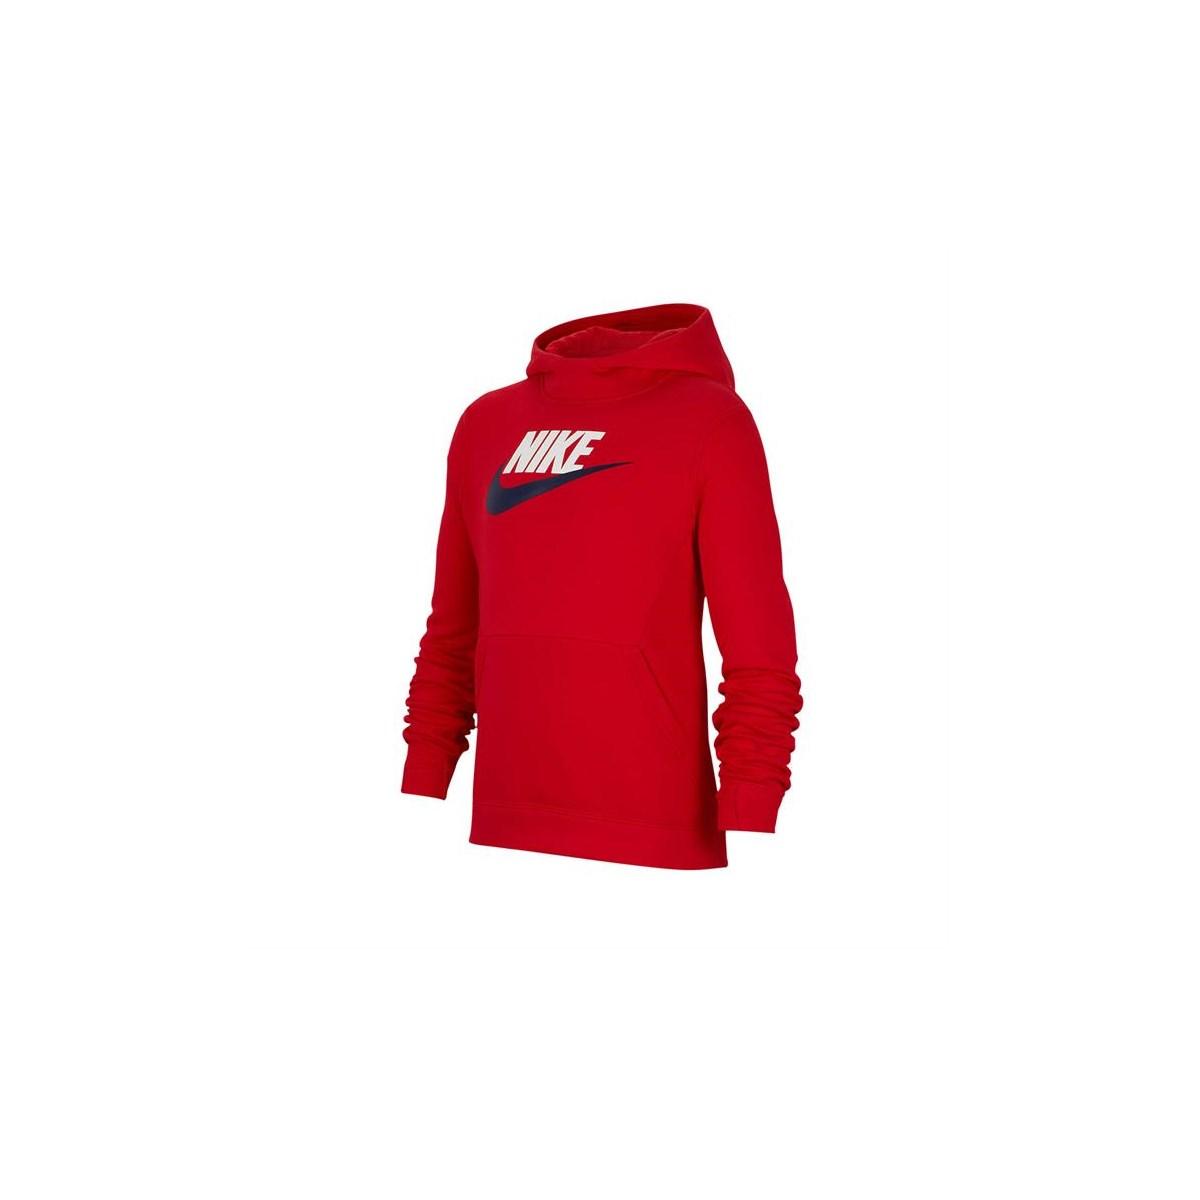 Hoodie Club Çocuk Kırmızı Sweatshirt